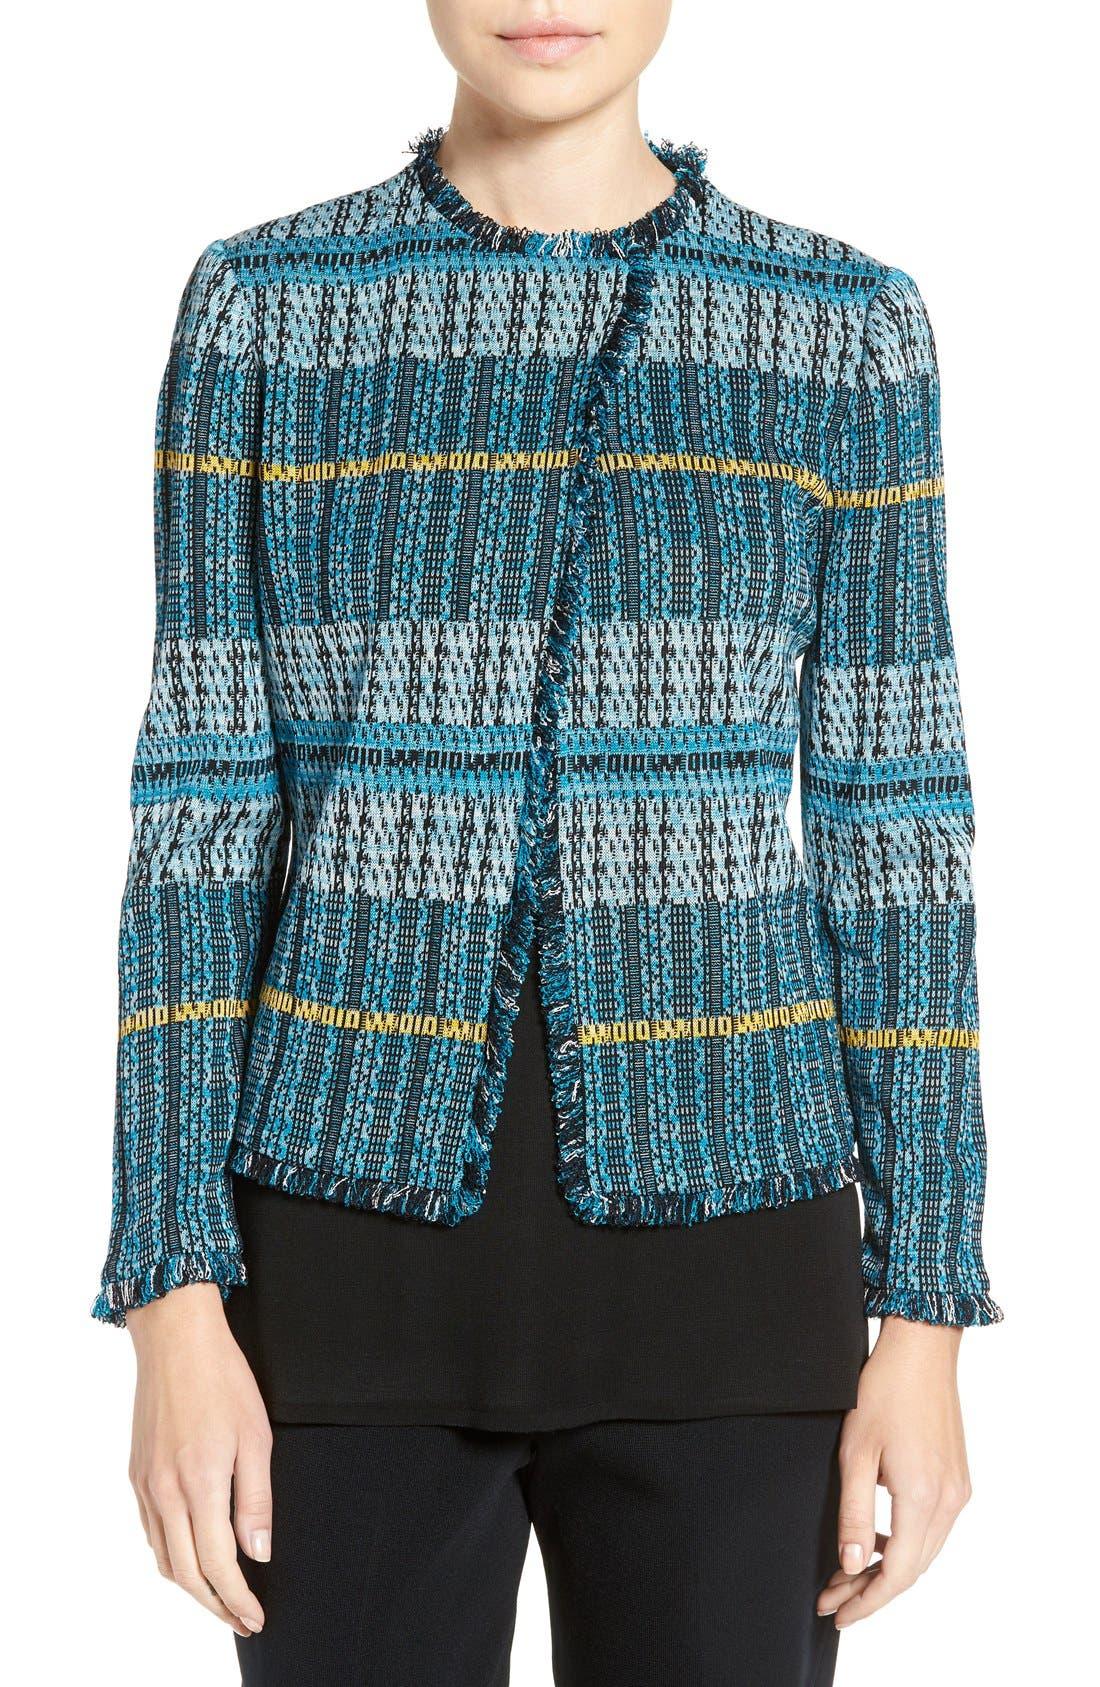 MING WANG Fringe Trim Jacquard Knit Jacket